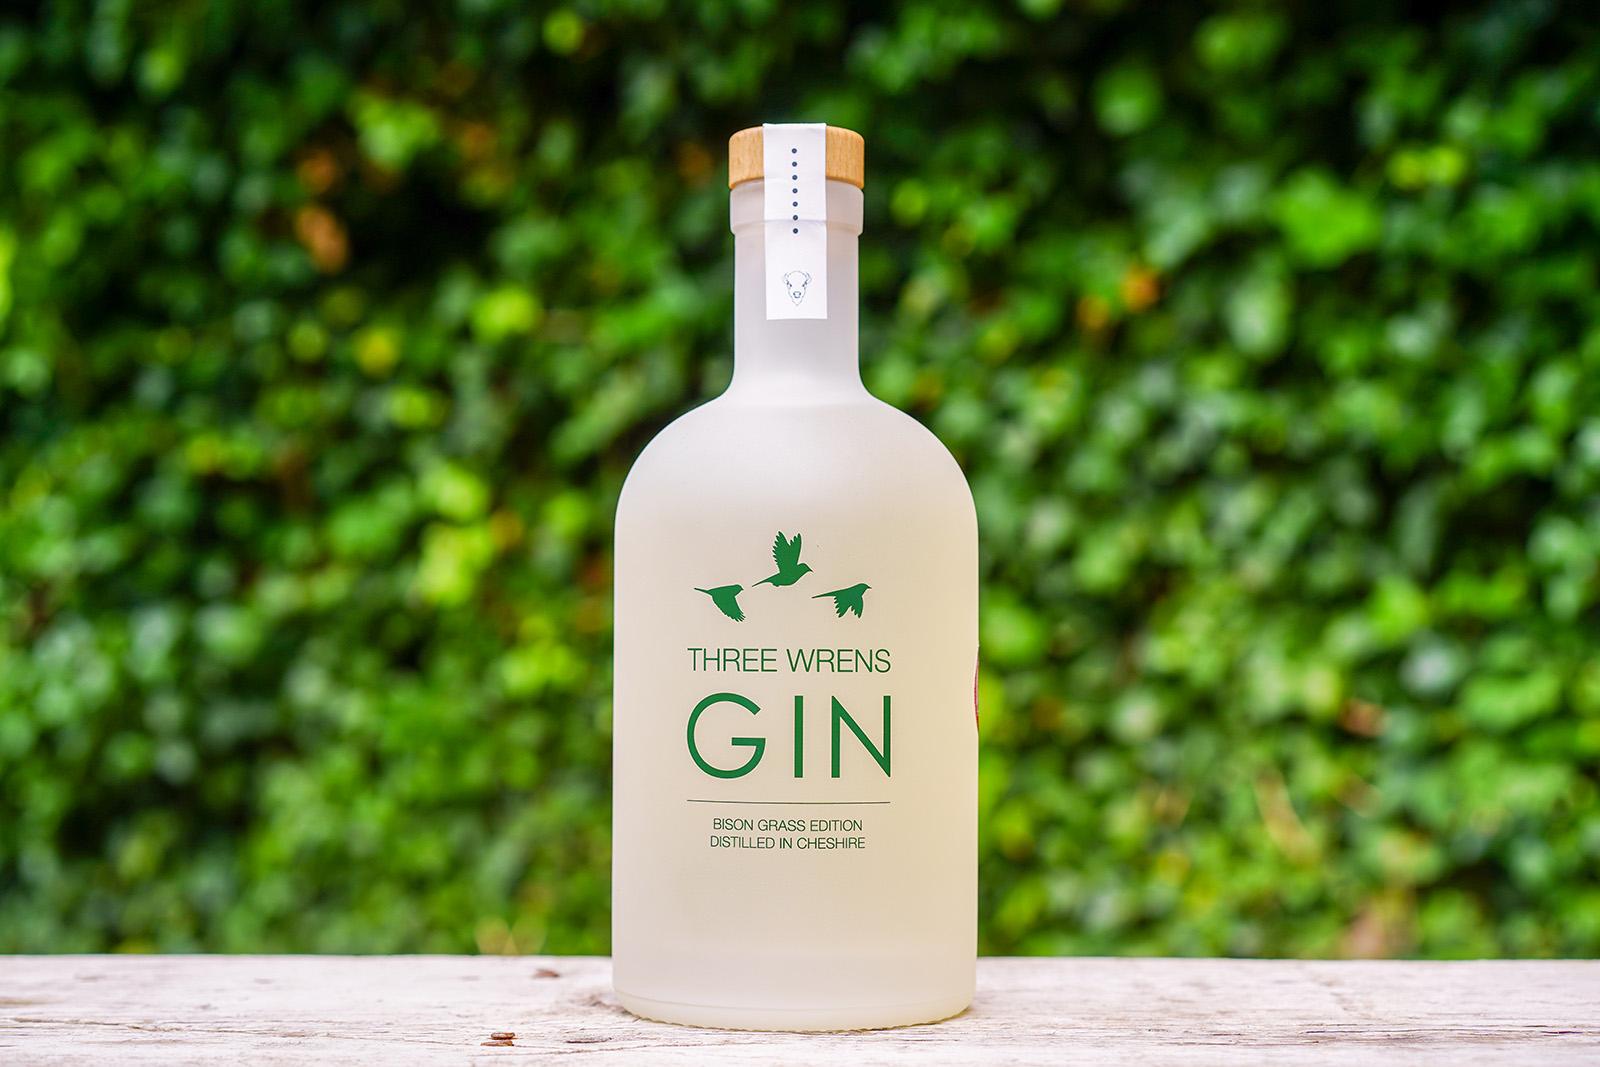 A bottle of Three Wrens Bison Grass Gin